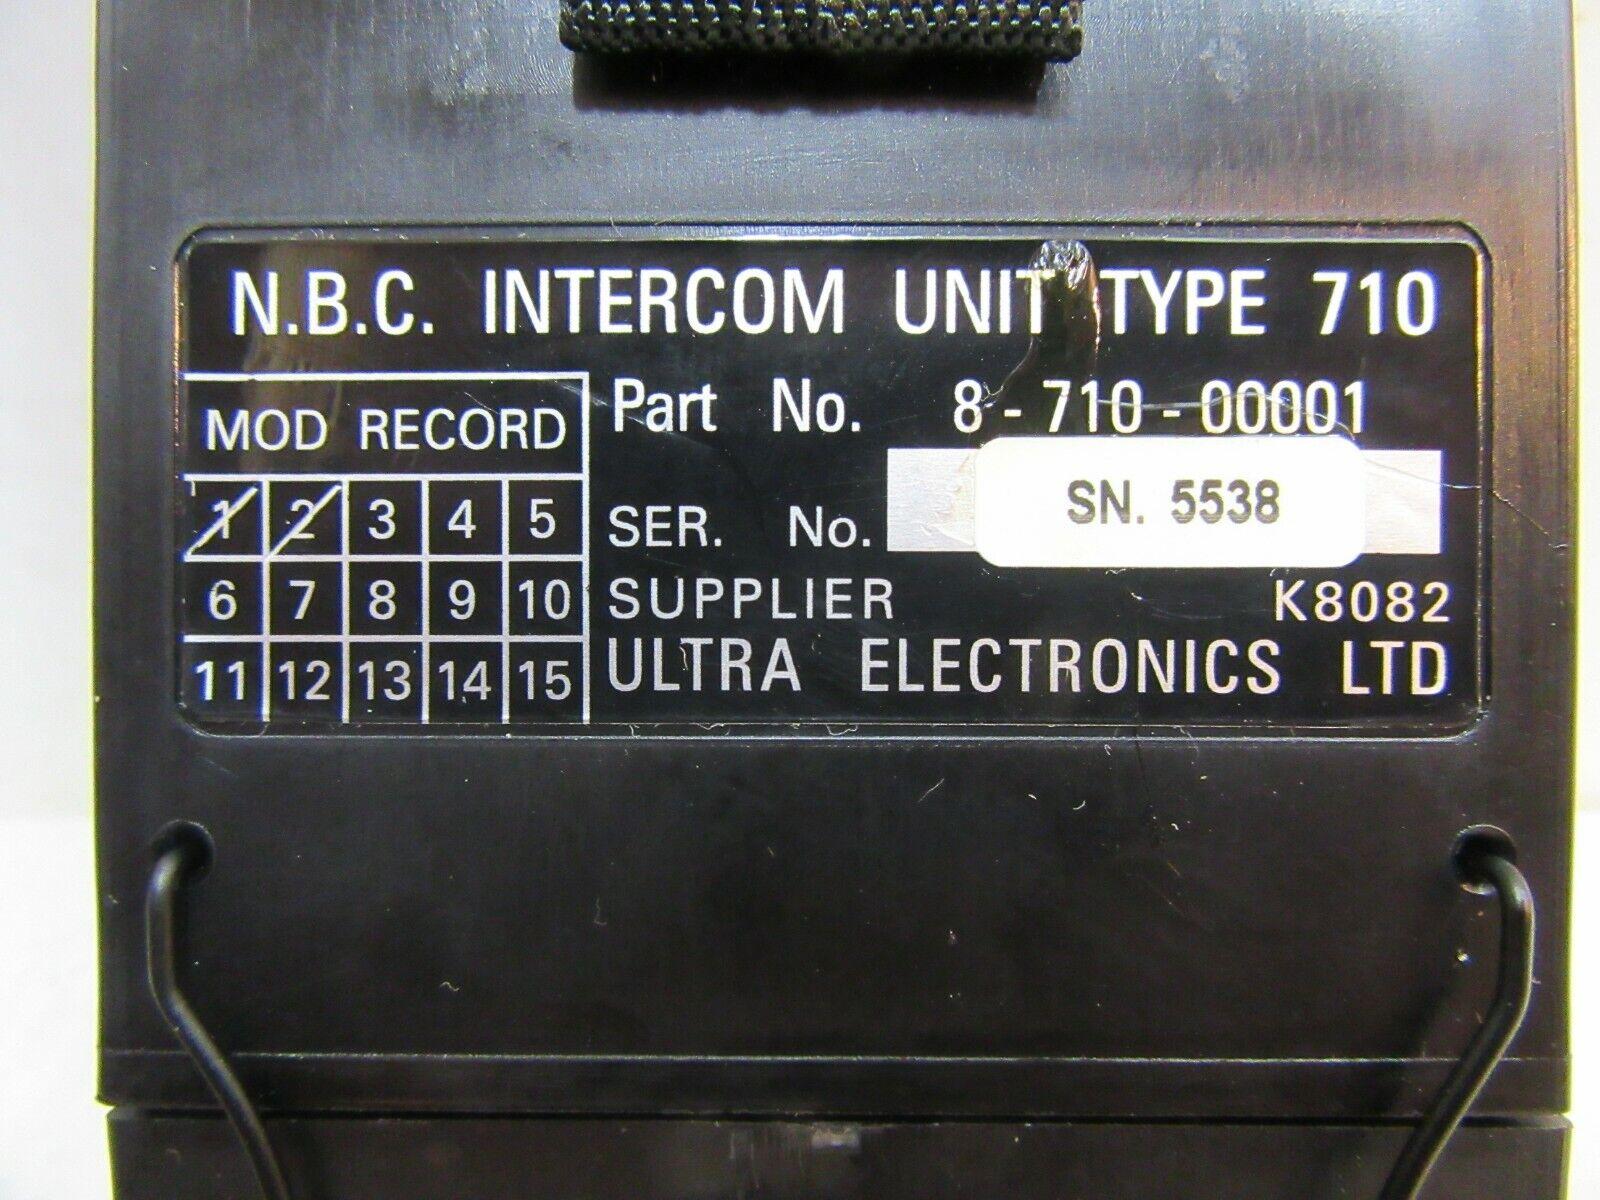 N.B.C I/C UNIT TYPE 710 USAF? RAF? AIRCRAFT HEADSET & MICROPHONE INTERCOM UNIT